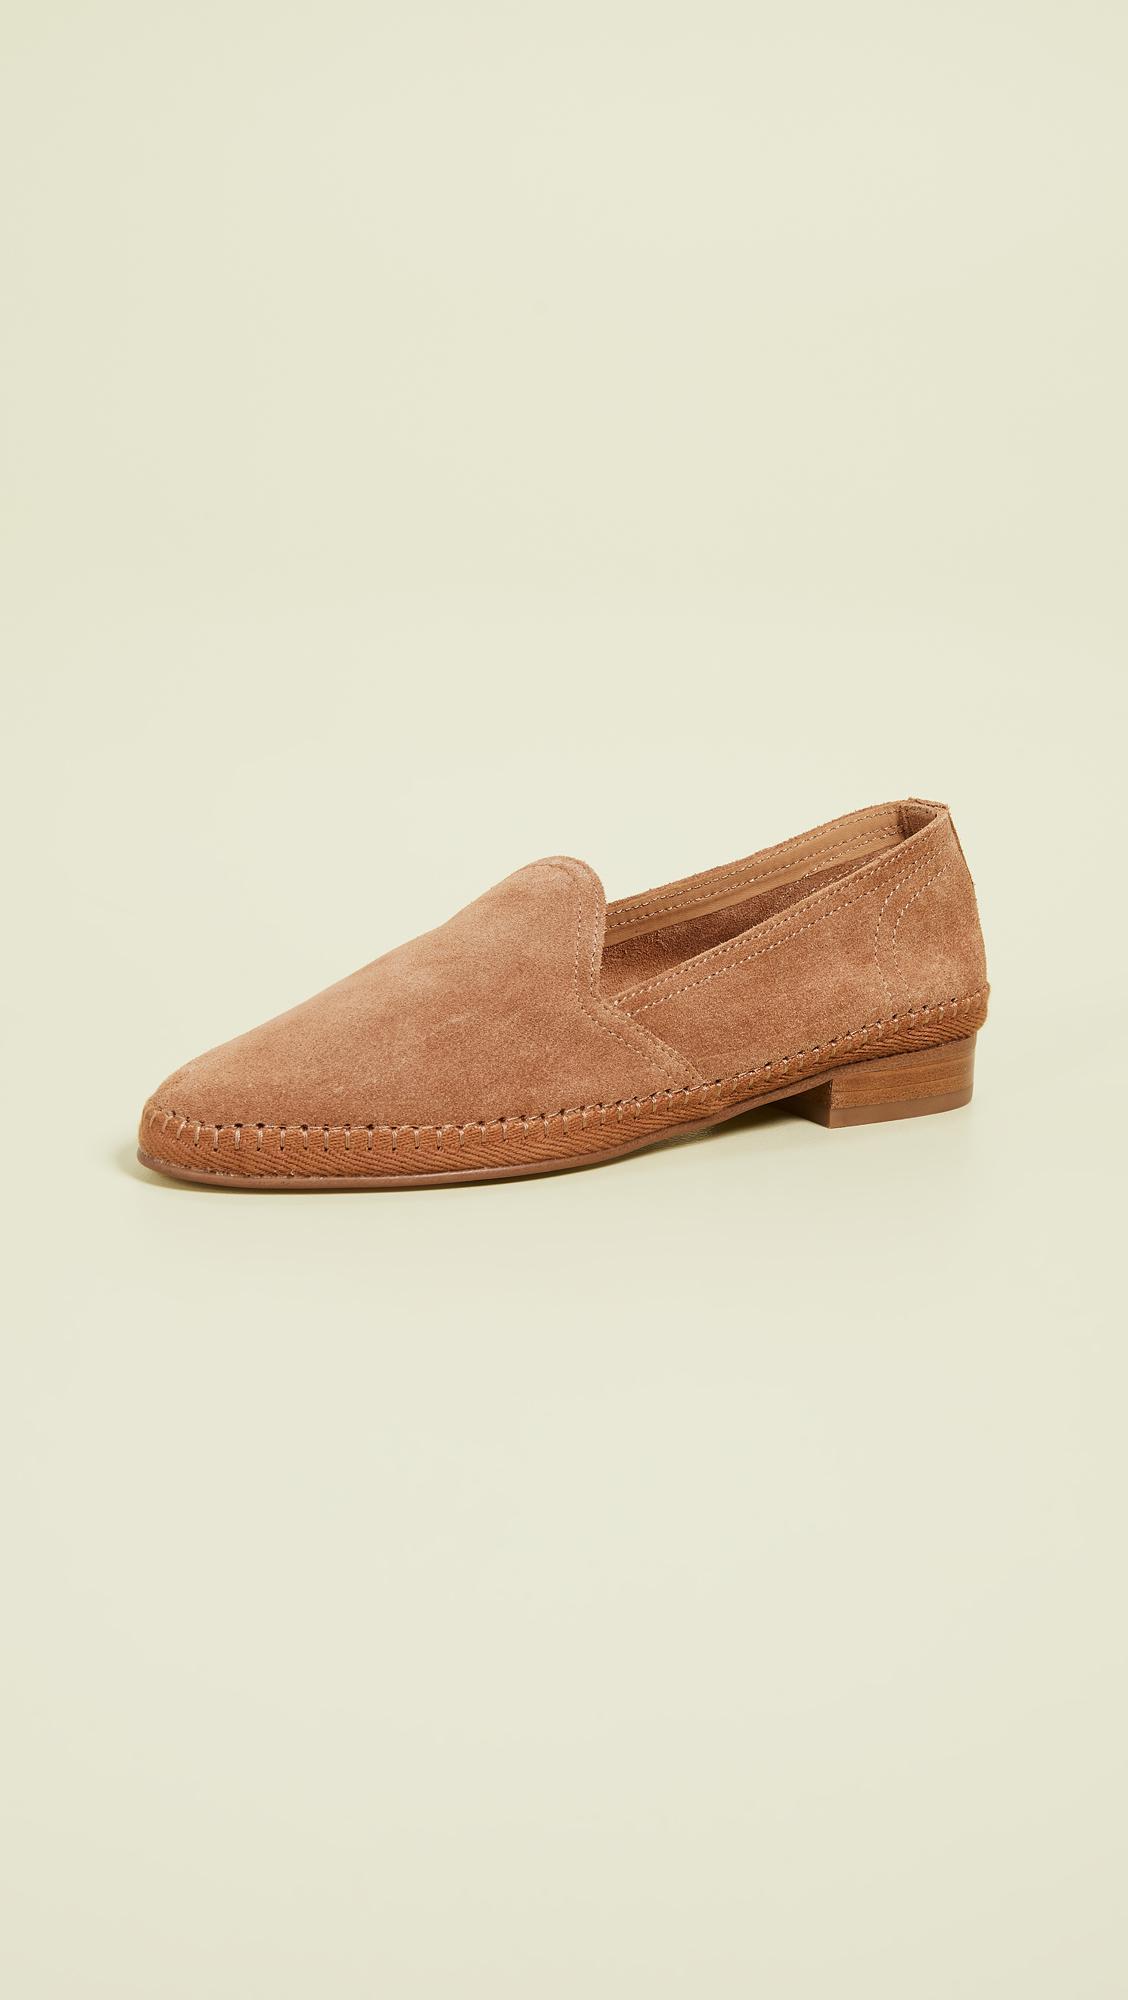 25af1334df5 Lyst - Soludos Venetian Loafers in Brown - Save 49%